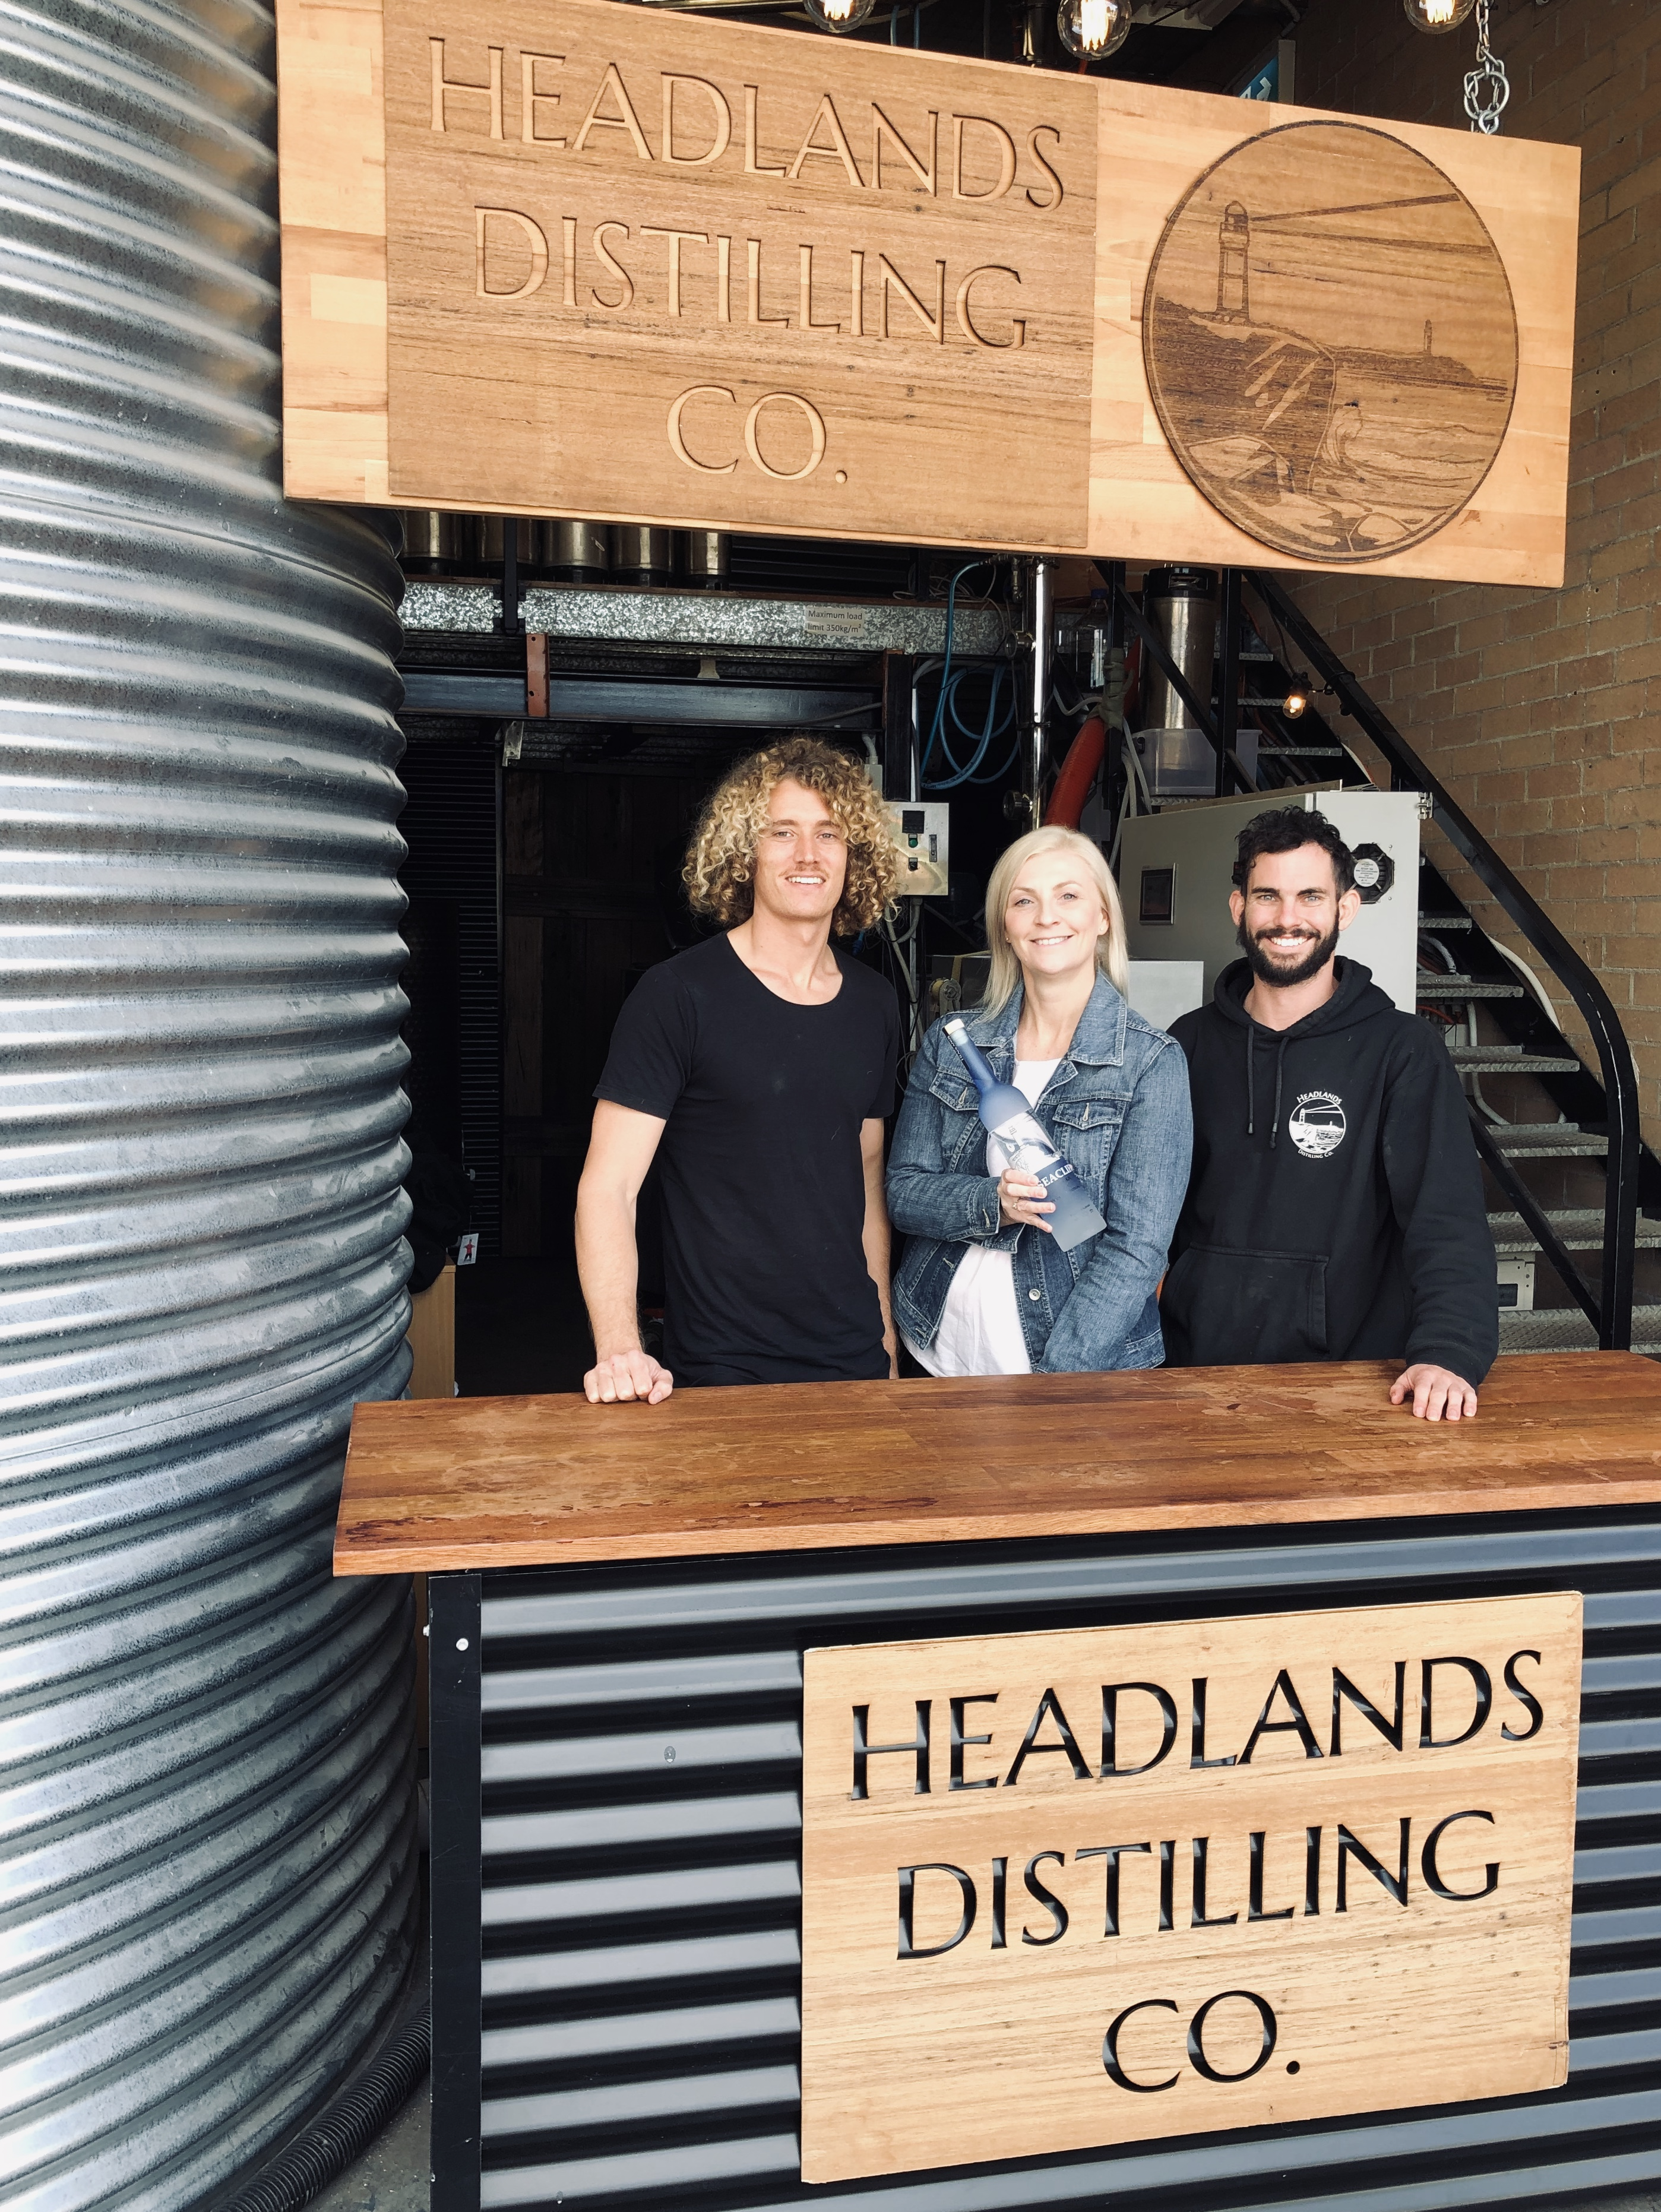 Headlands Distilling Co ,Wollongong's first vodka distillery